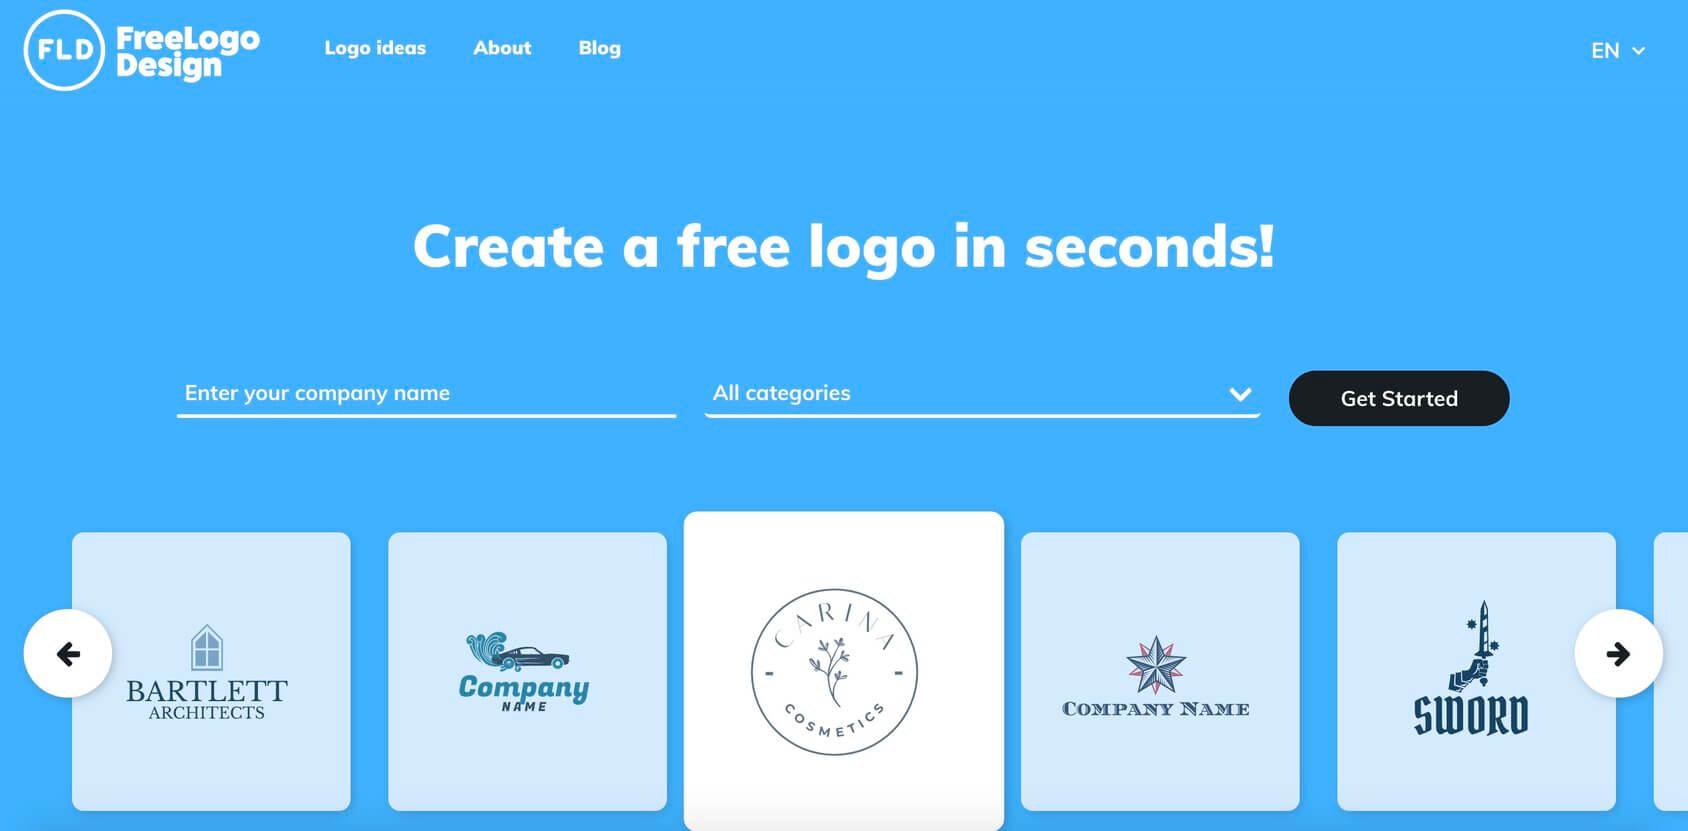 FreeLogoDesign homepage